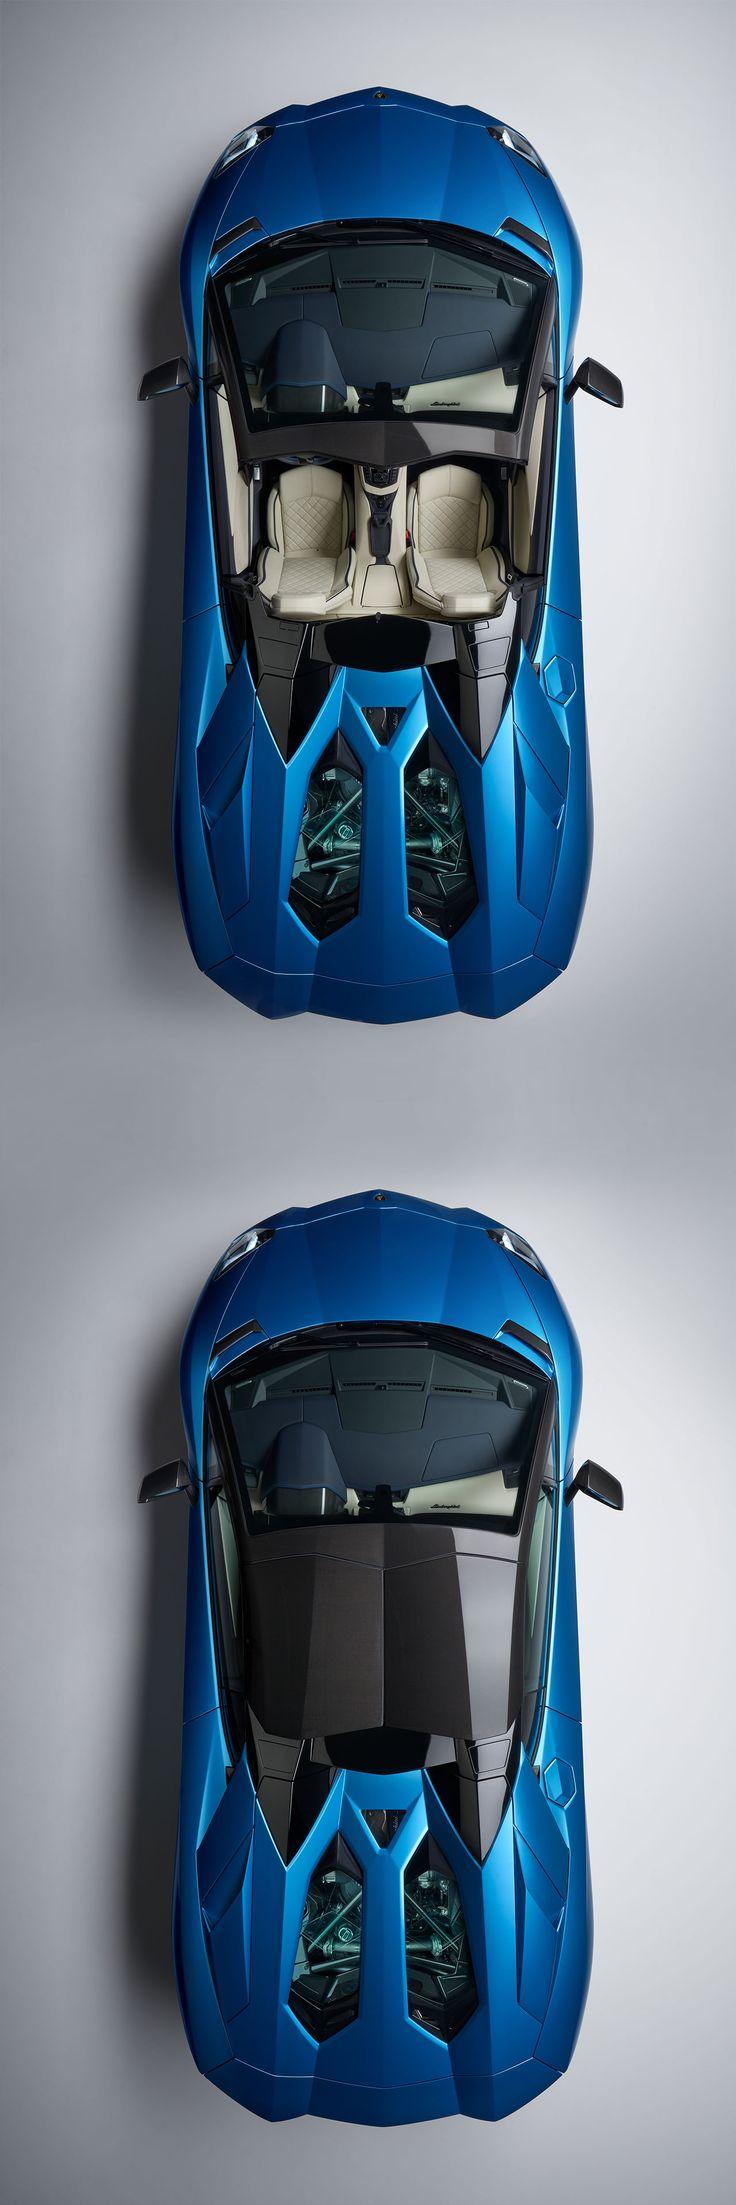 Lamborghini Aventador S Roadster https://www.amazon.co.uk/Baby-Car-Mirror-Shatterproof-Installation/dp/B06XHG6SSY